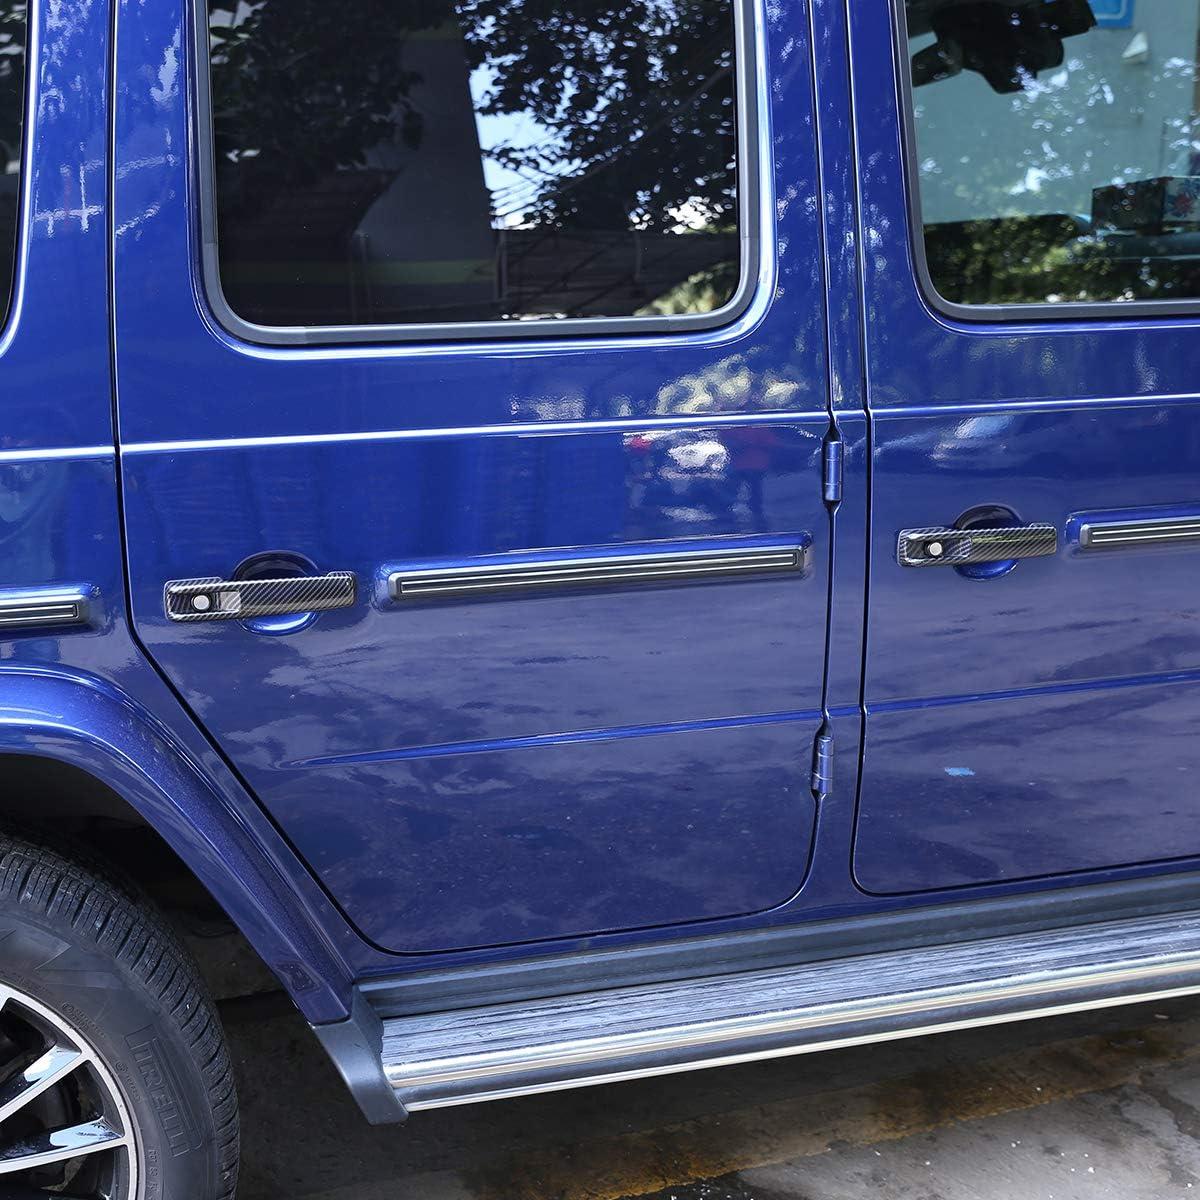 ABS Car Side Door Handle Cover Trim for Mercedes Benz G Class W463 G500 2019-2020 Auto Accessory Carbon Fiber